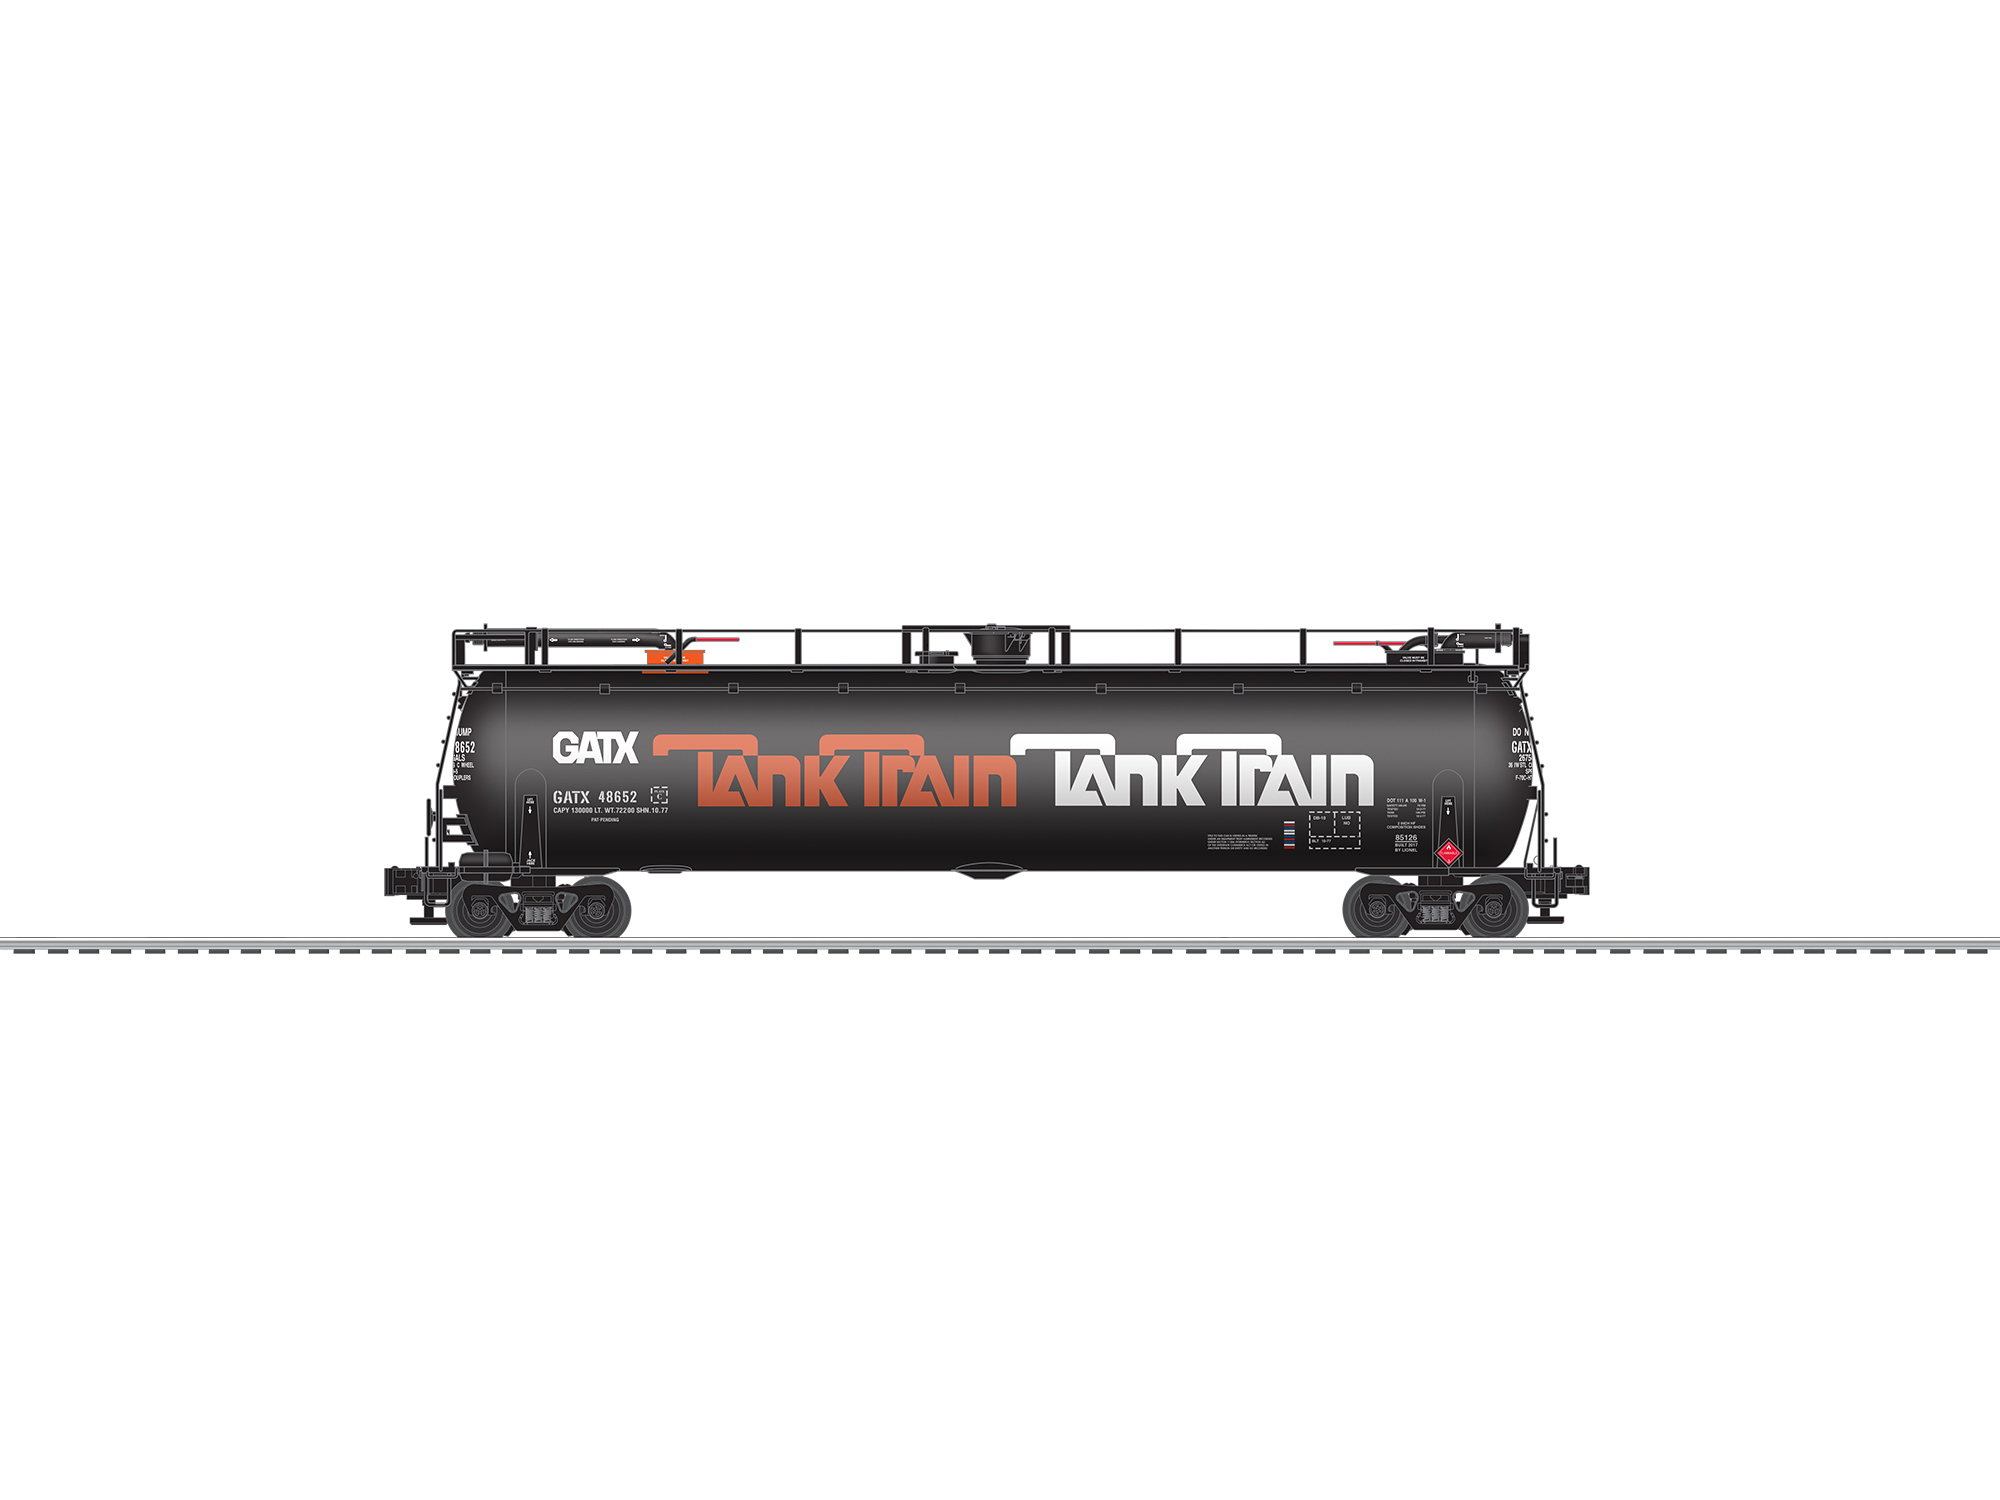 LNL685126 Lionel O Tank Train orange #1 434-685126